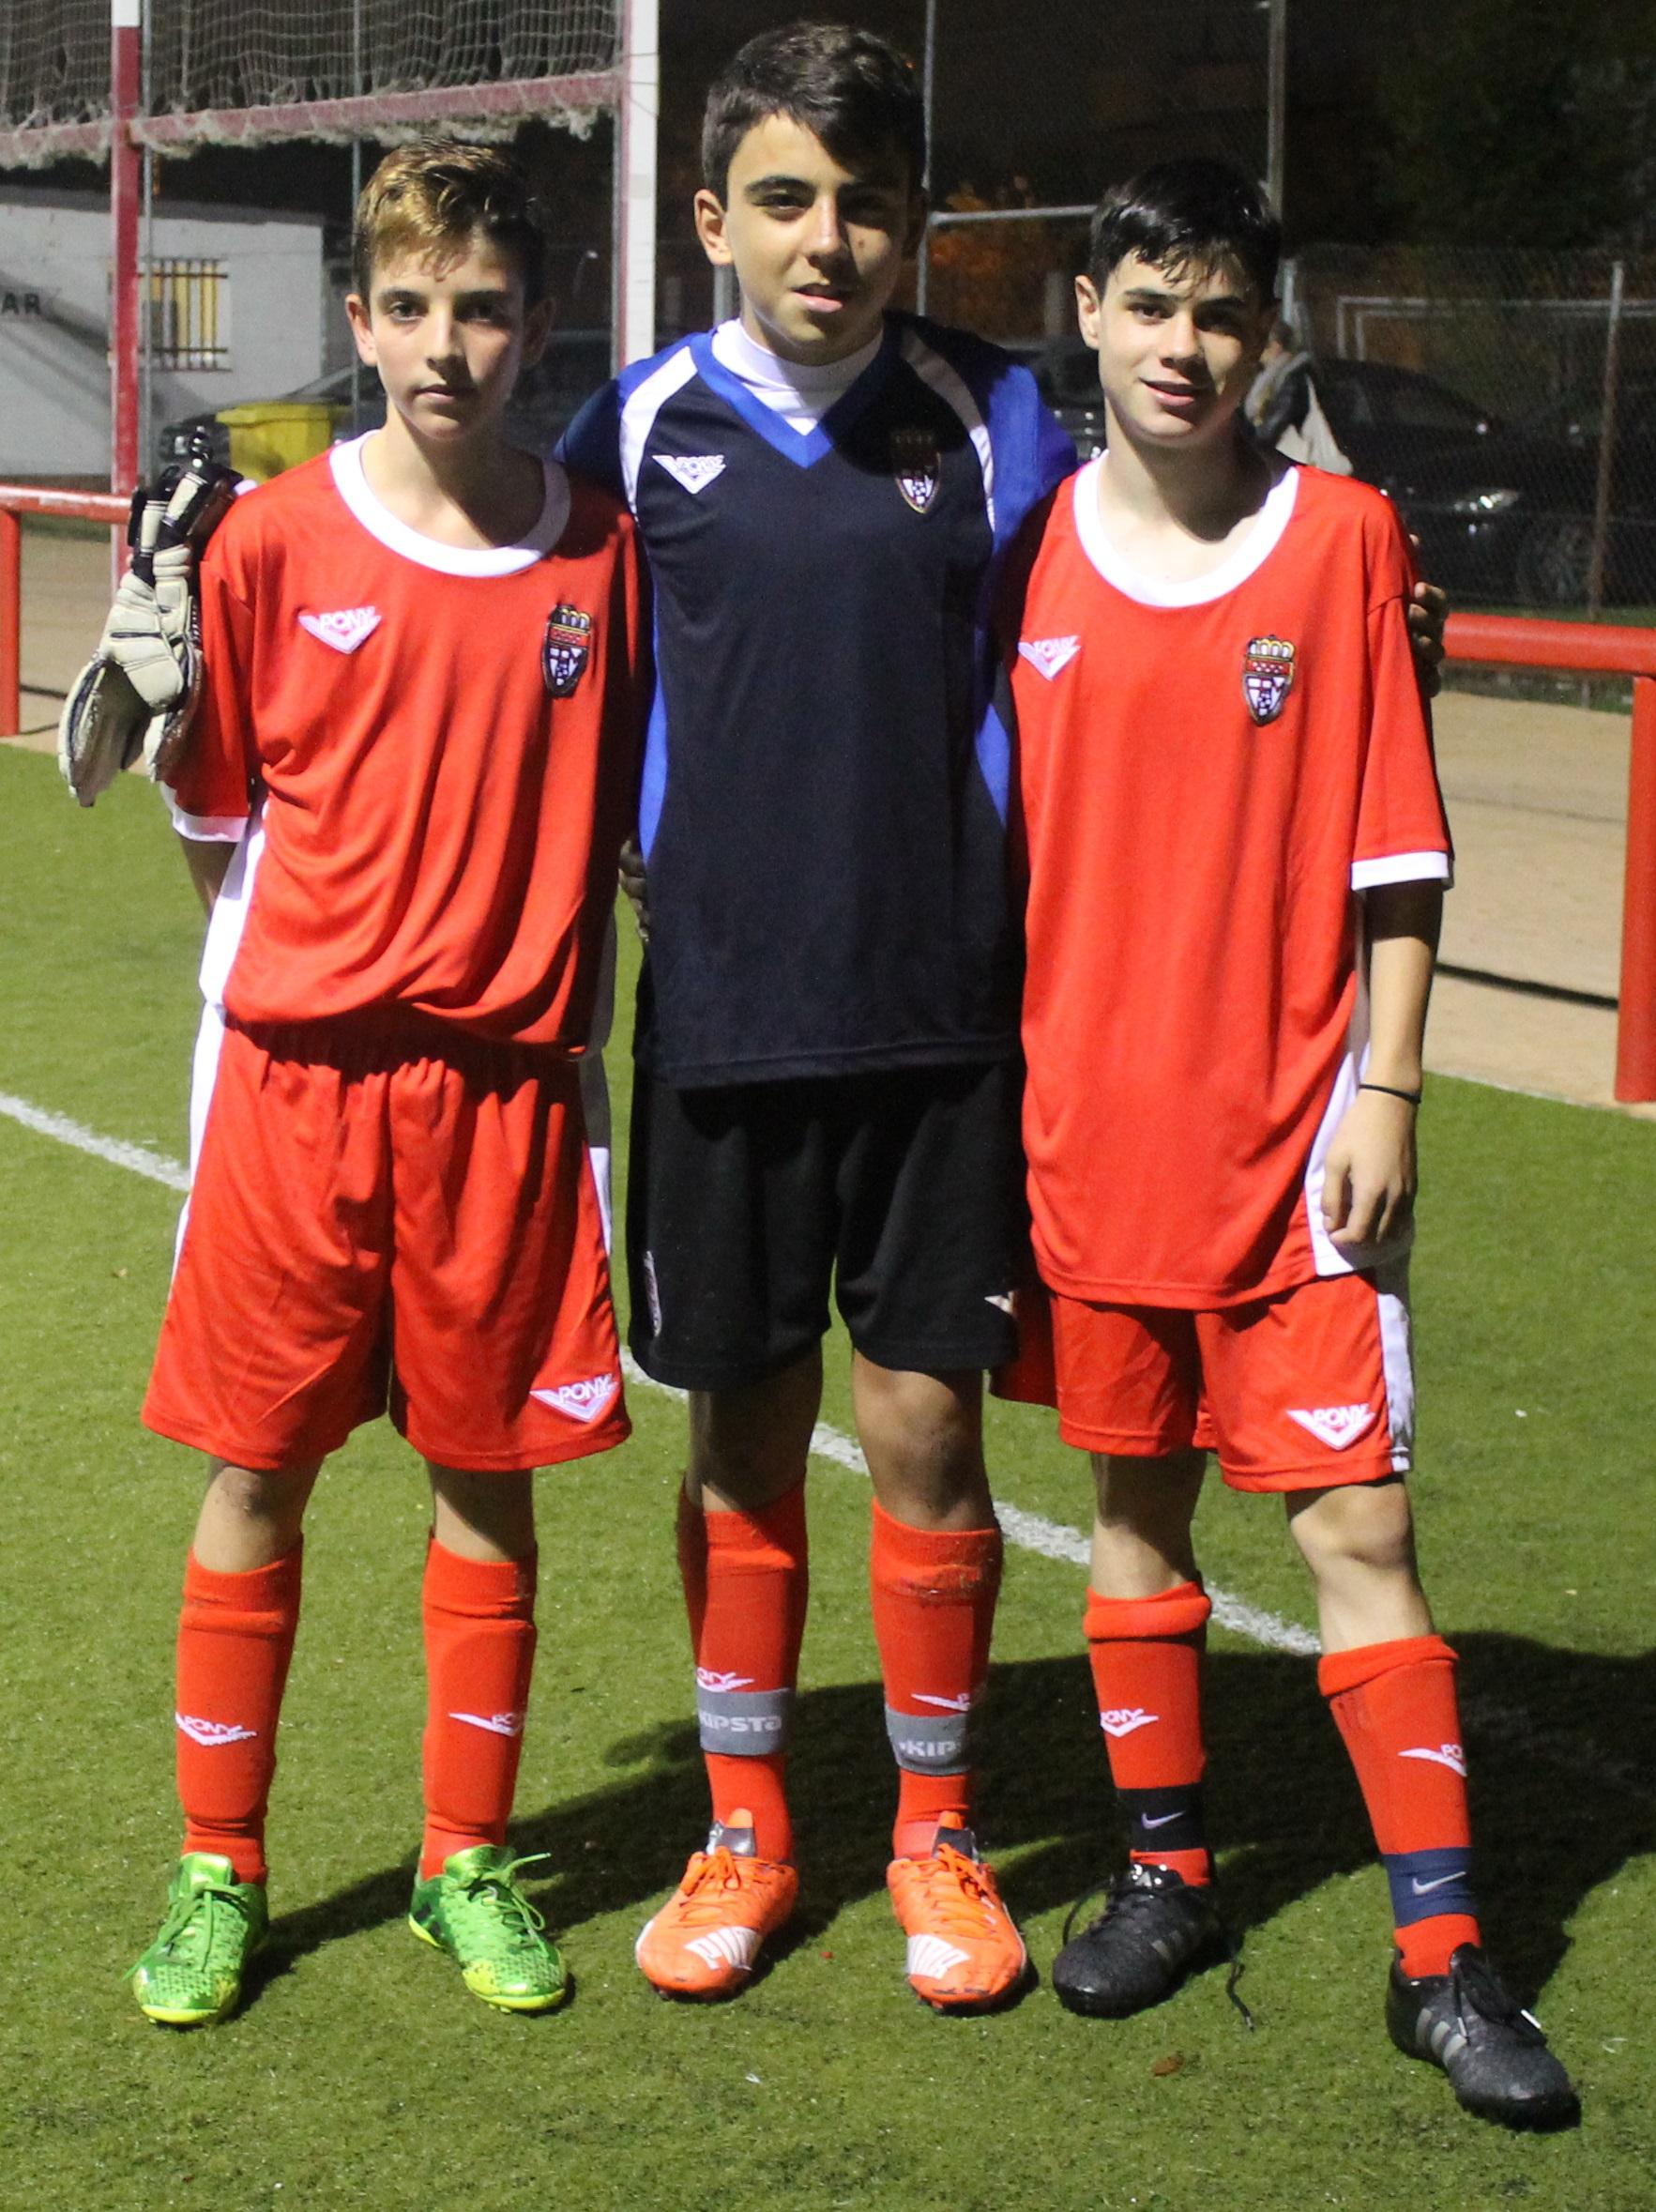 Tres jugadores del Infantil A, en la primera convocatoria de la temporada en el centro de tecnificación de la RFFM